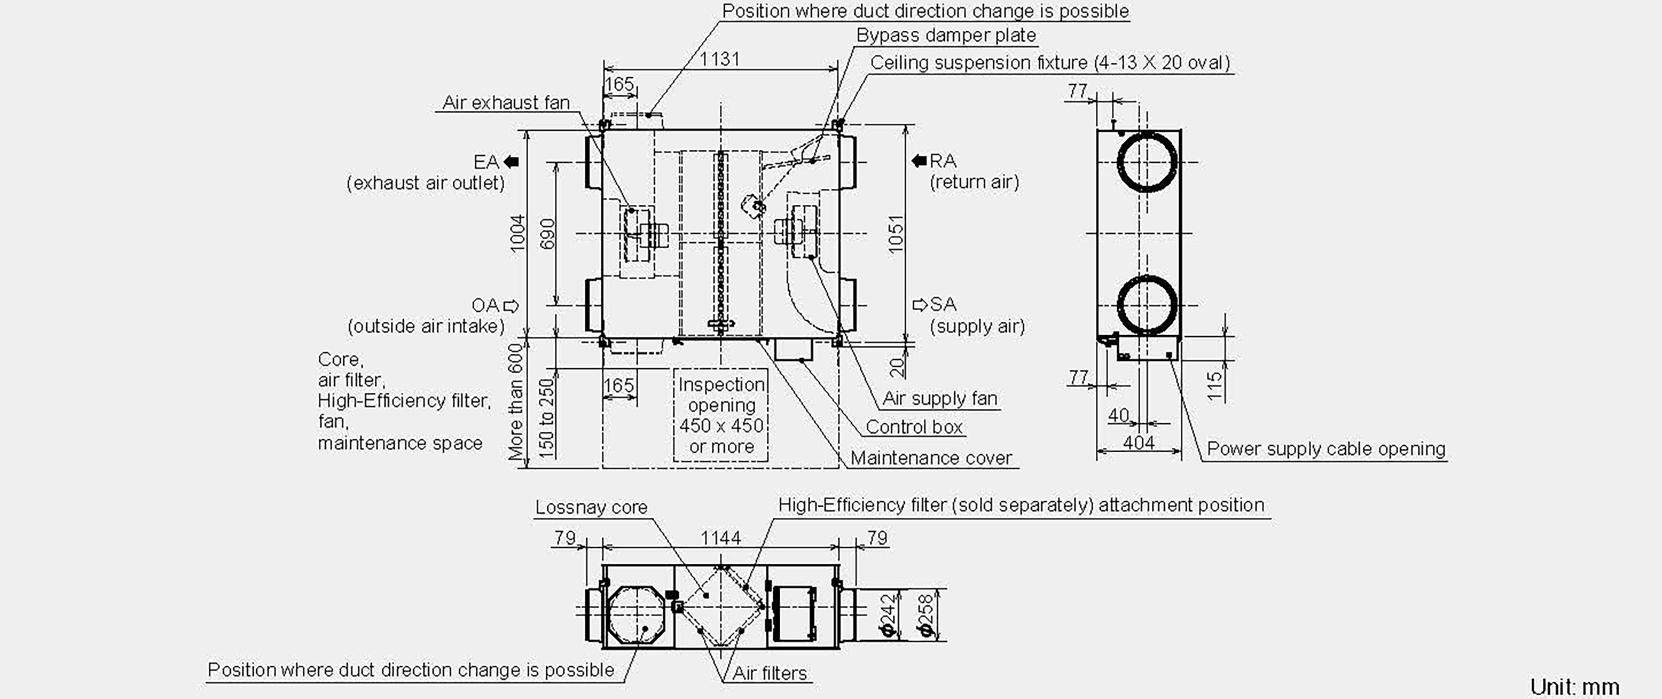 hight resolution of mitsubishi lgh80 configuration